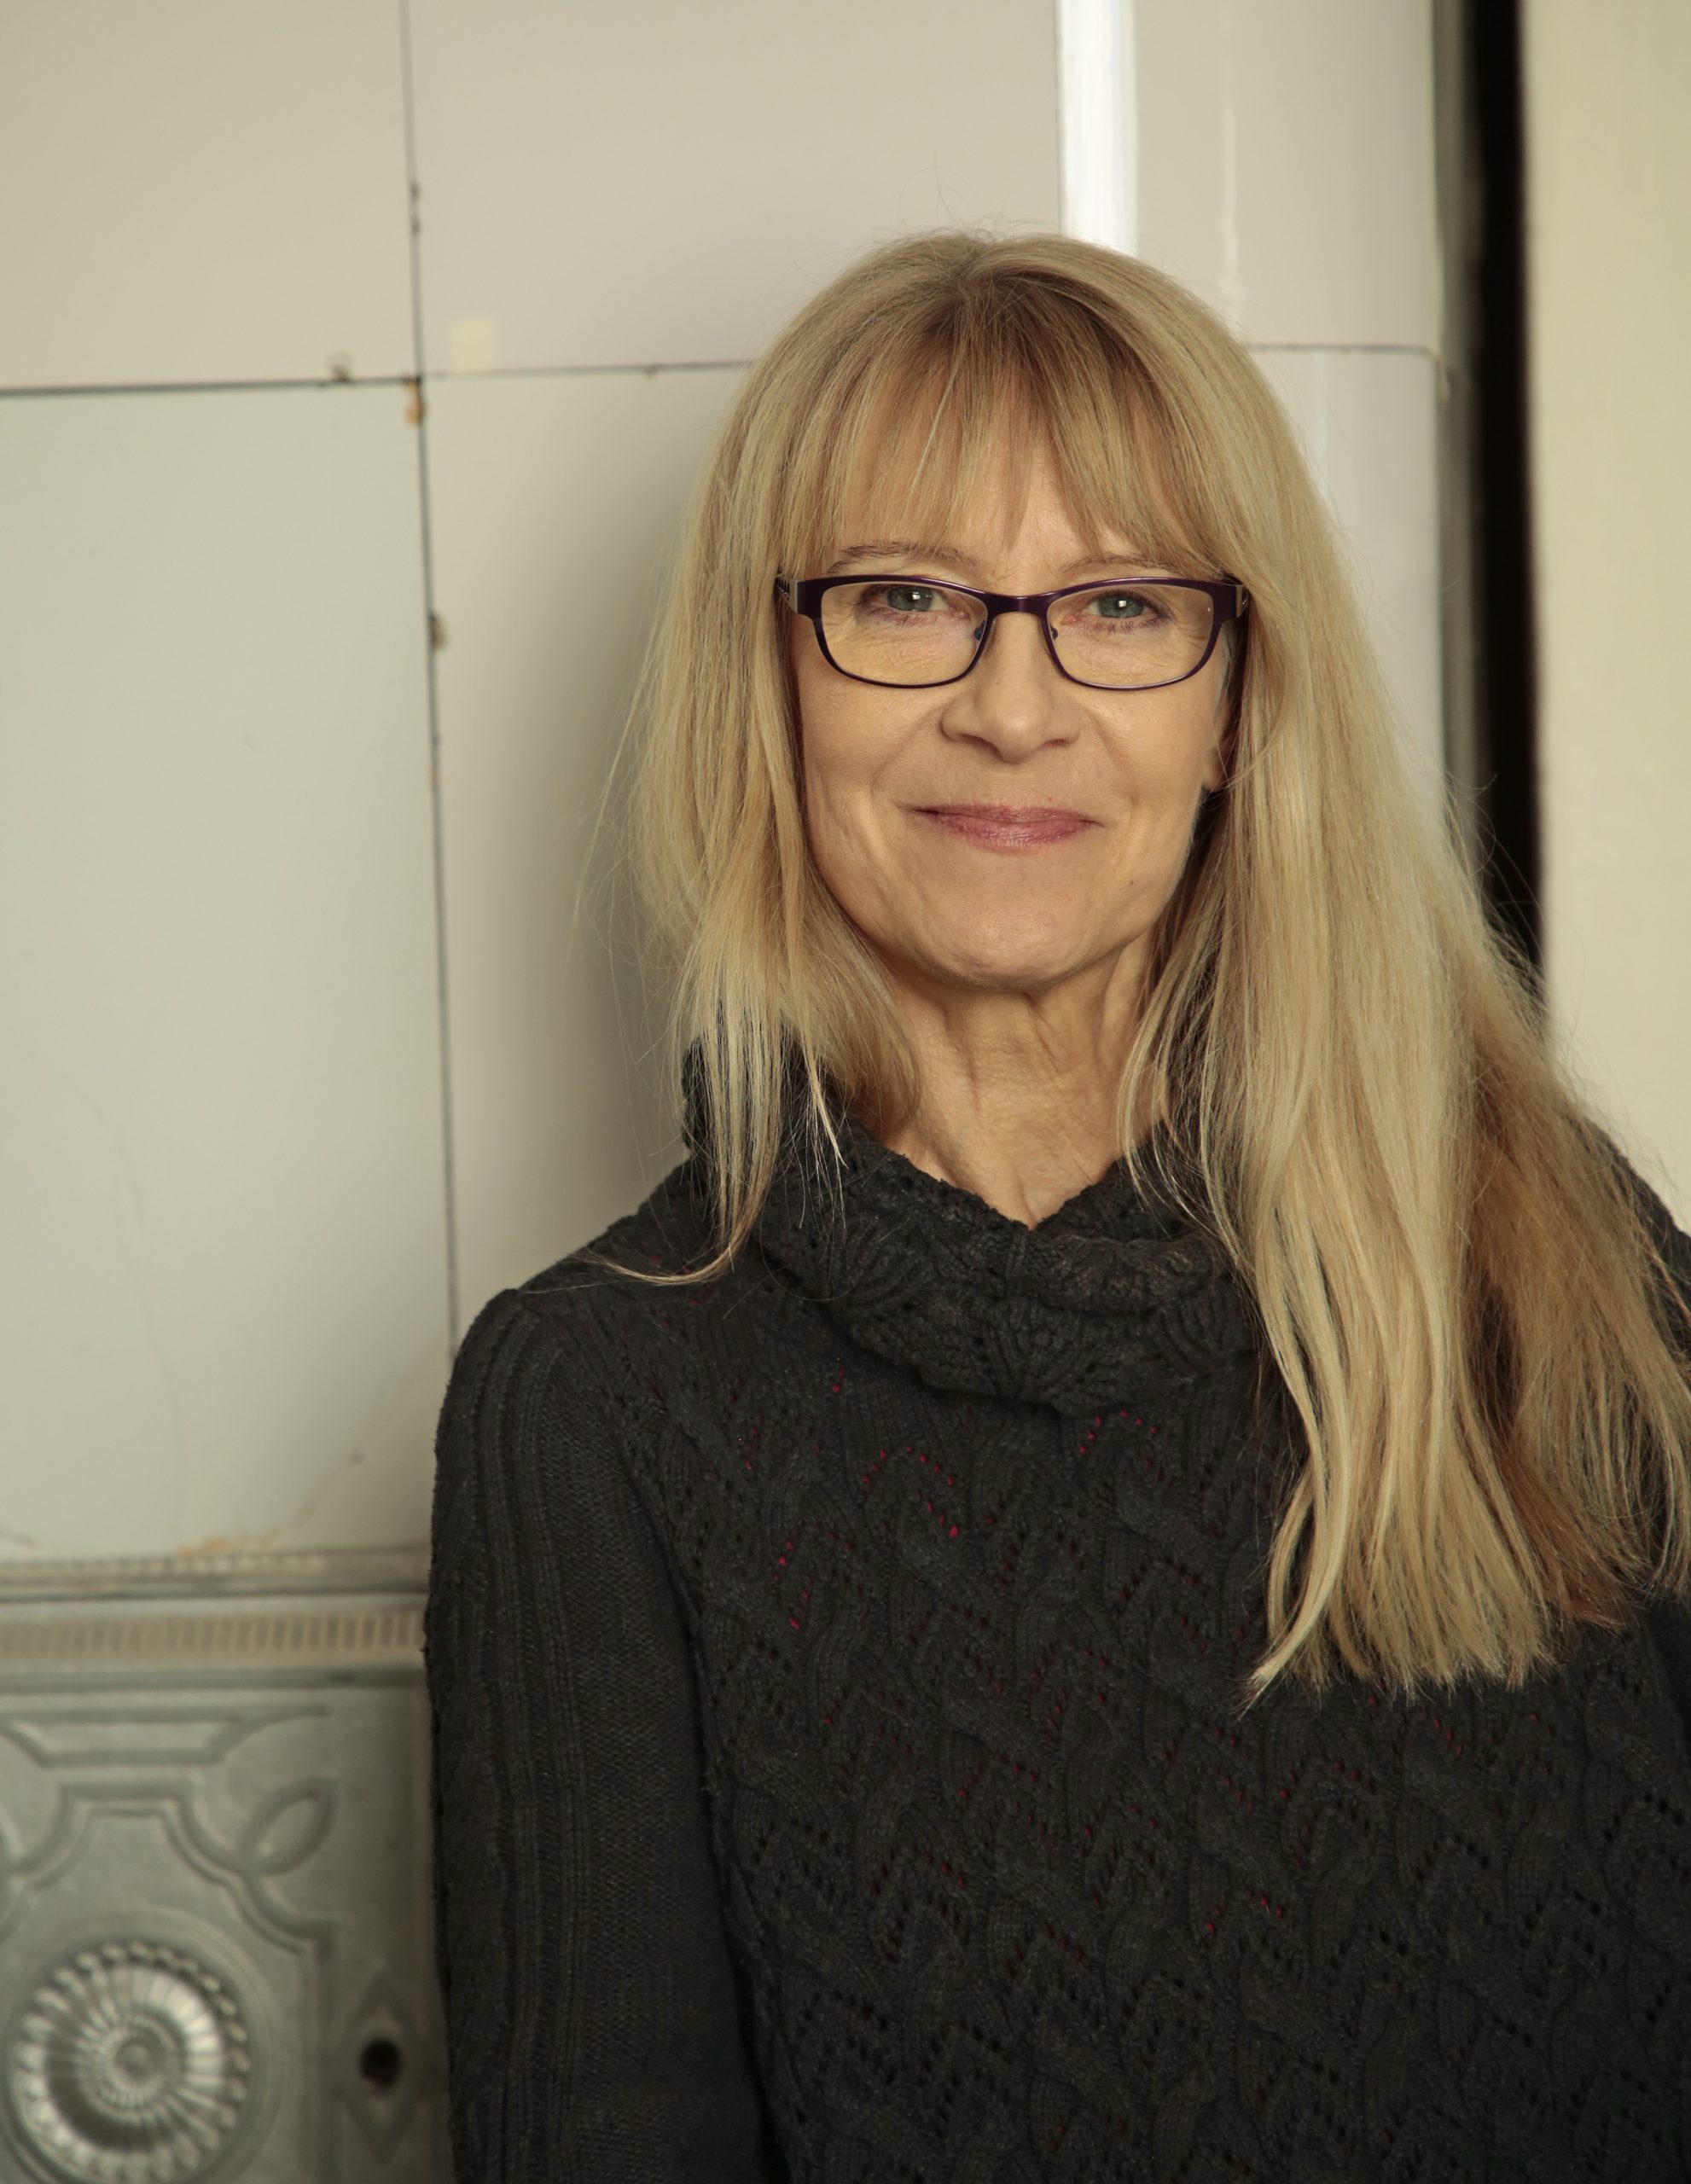 Teatterinjohtaja Helka-Maria Kinnunen